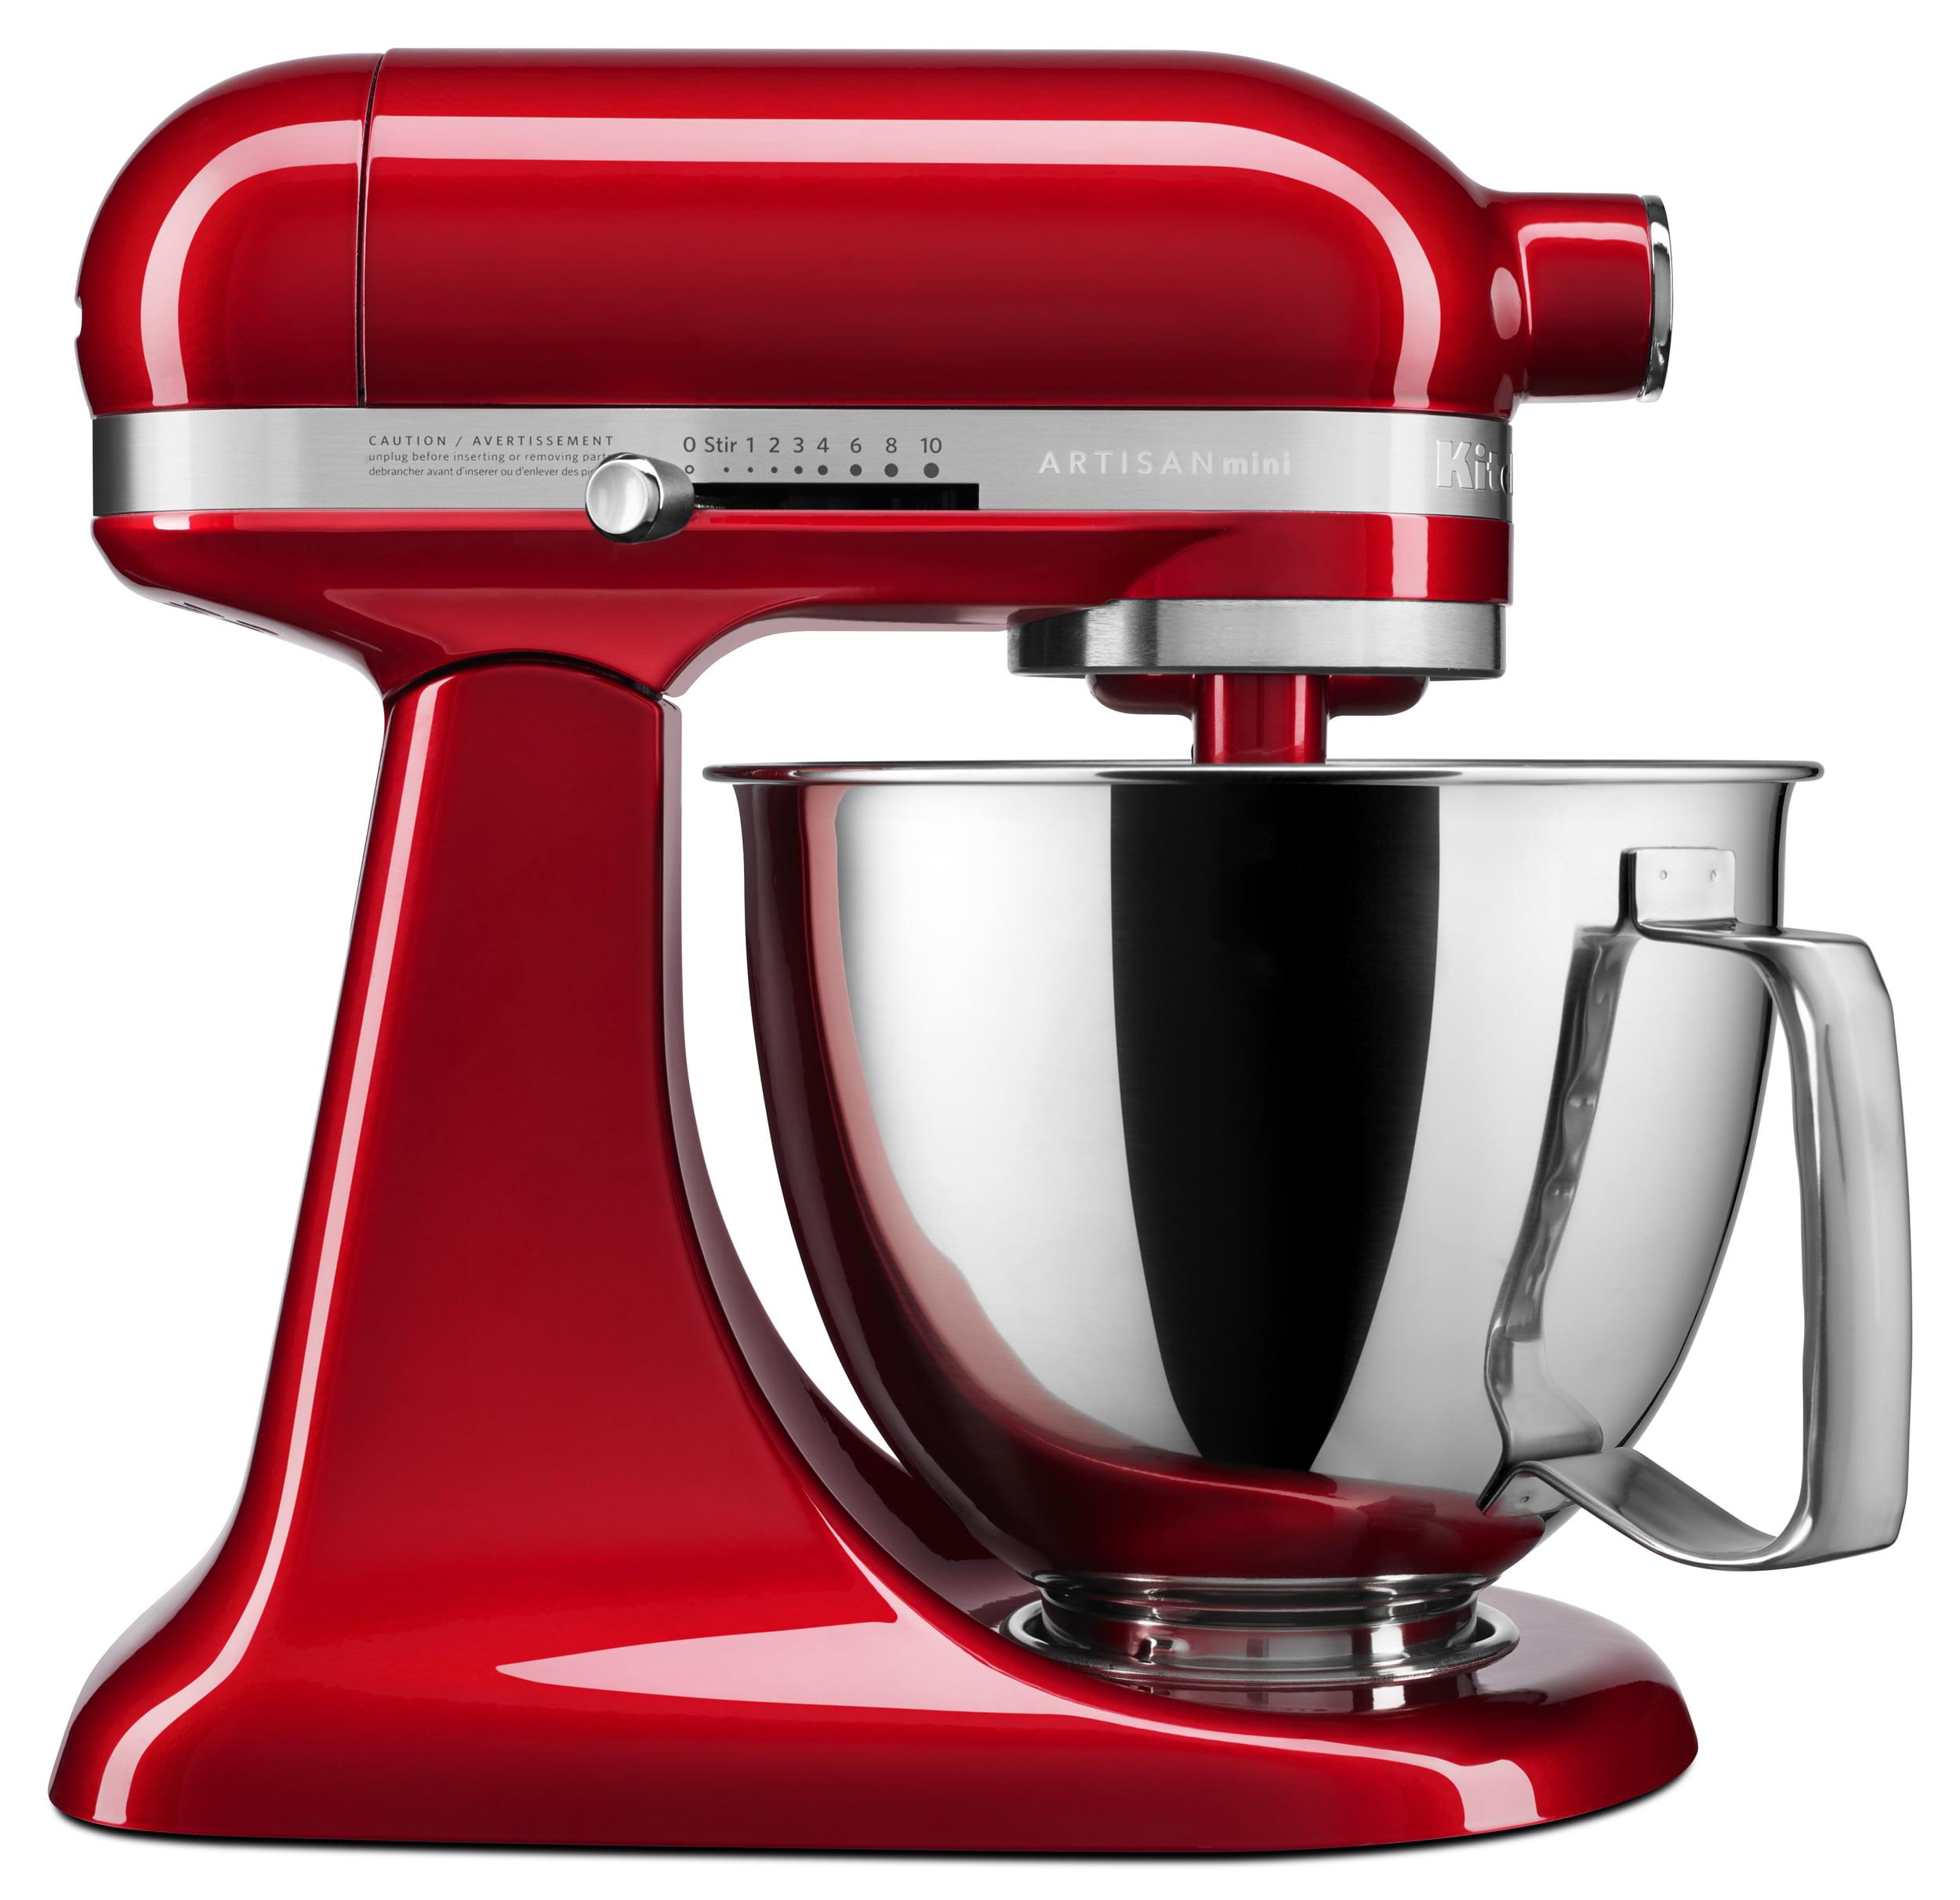 KitchenAid Artisan Mini 3.5 Quart Tilt-Head Stand Mixer, Candy Apple Red (KSM3316XCA)